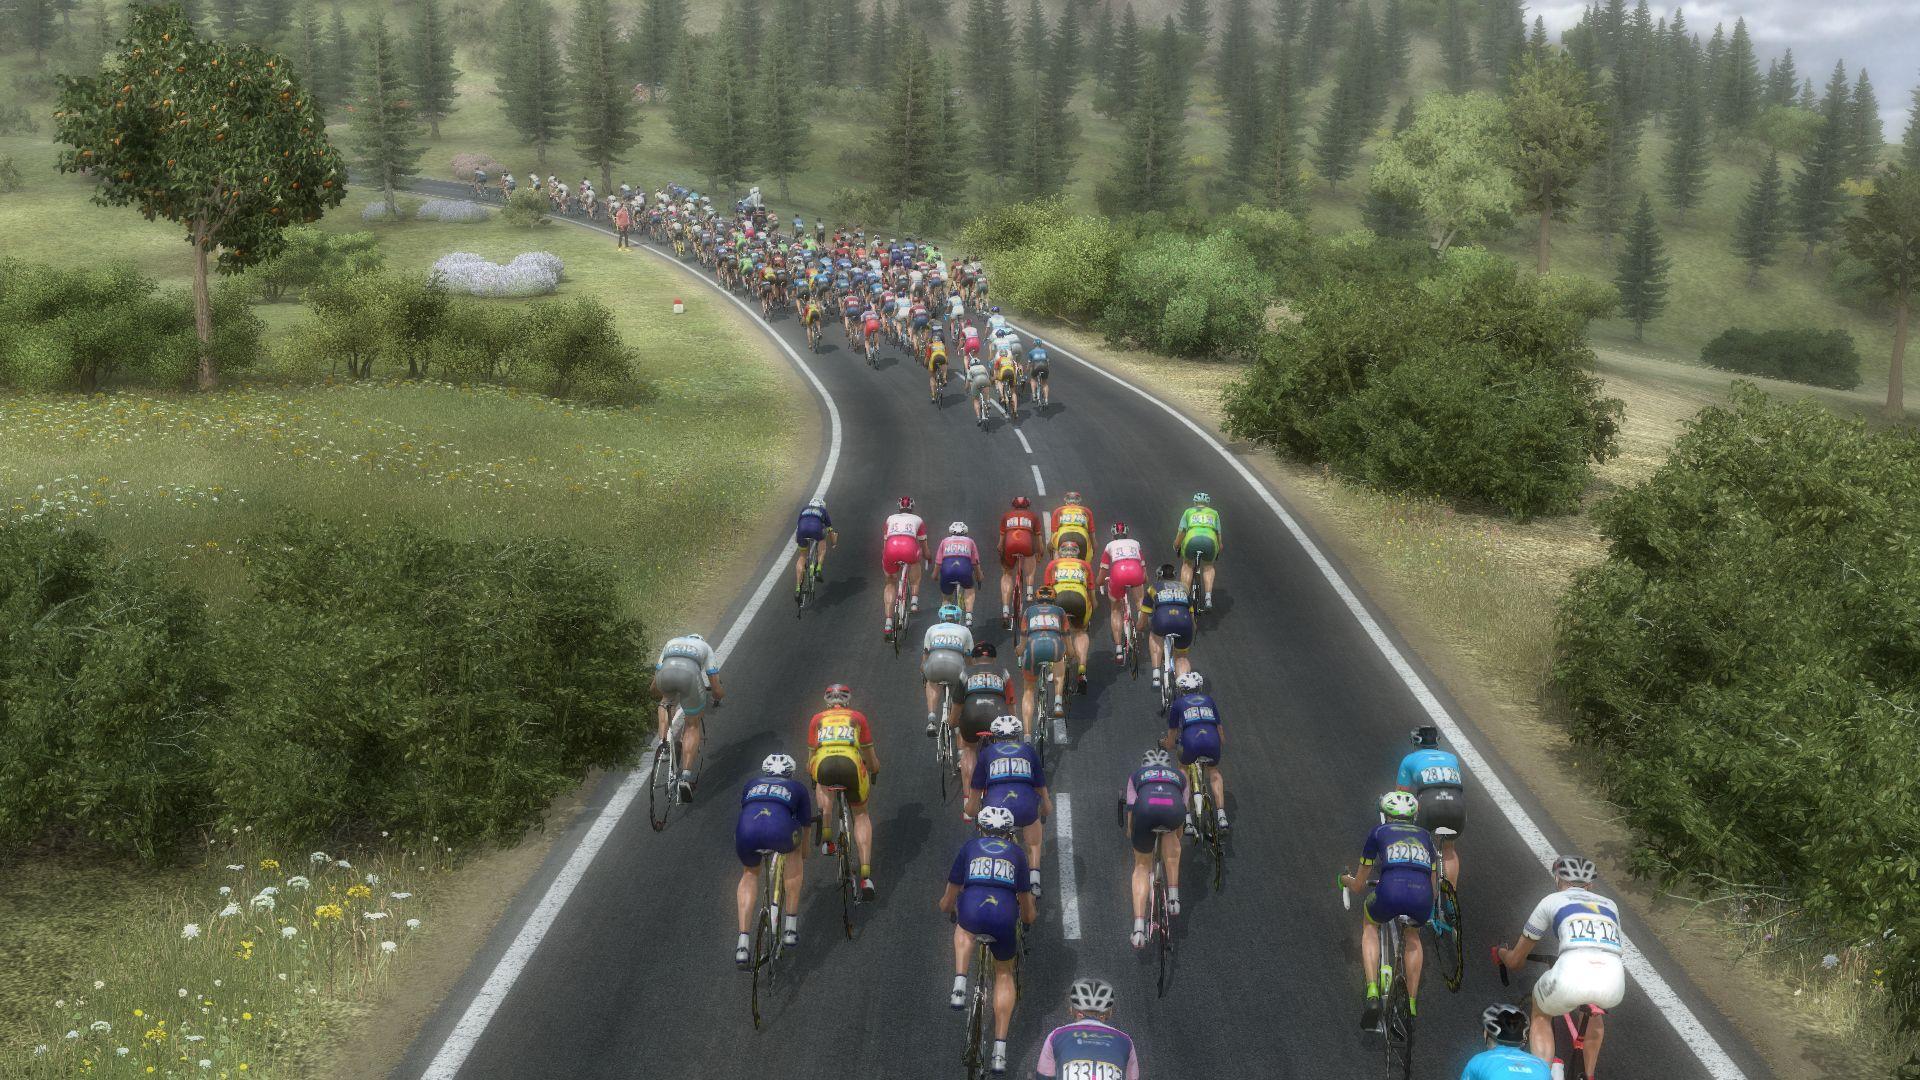 pcmdaily.com/images/mg/2020/Reports/GTM/Giro/S12/mg20_giro_s12_27.jpg